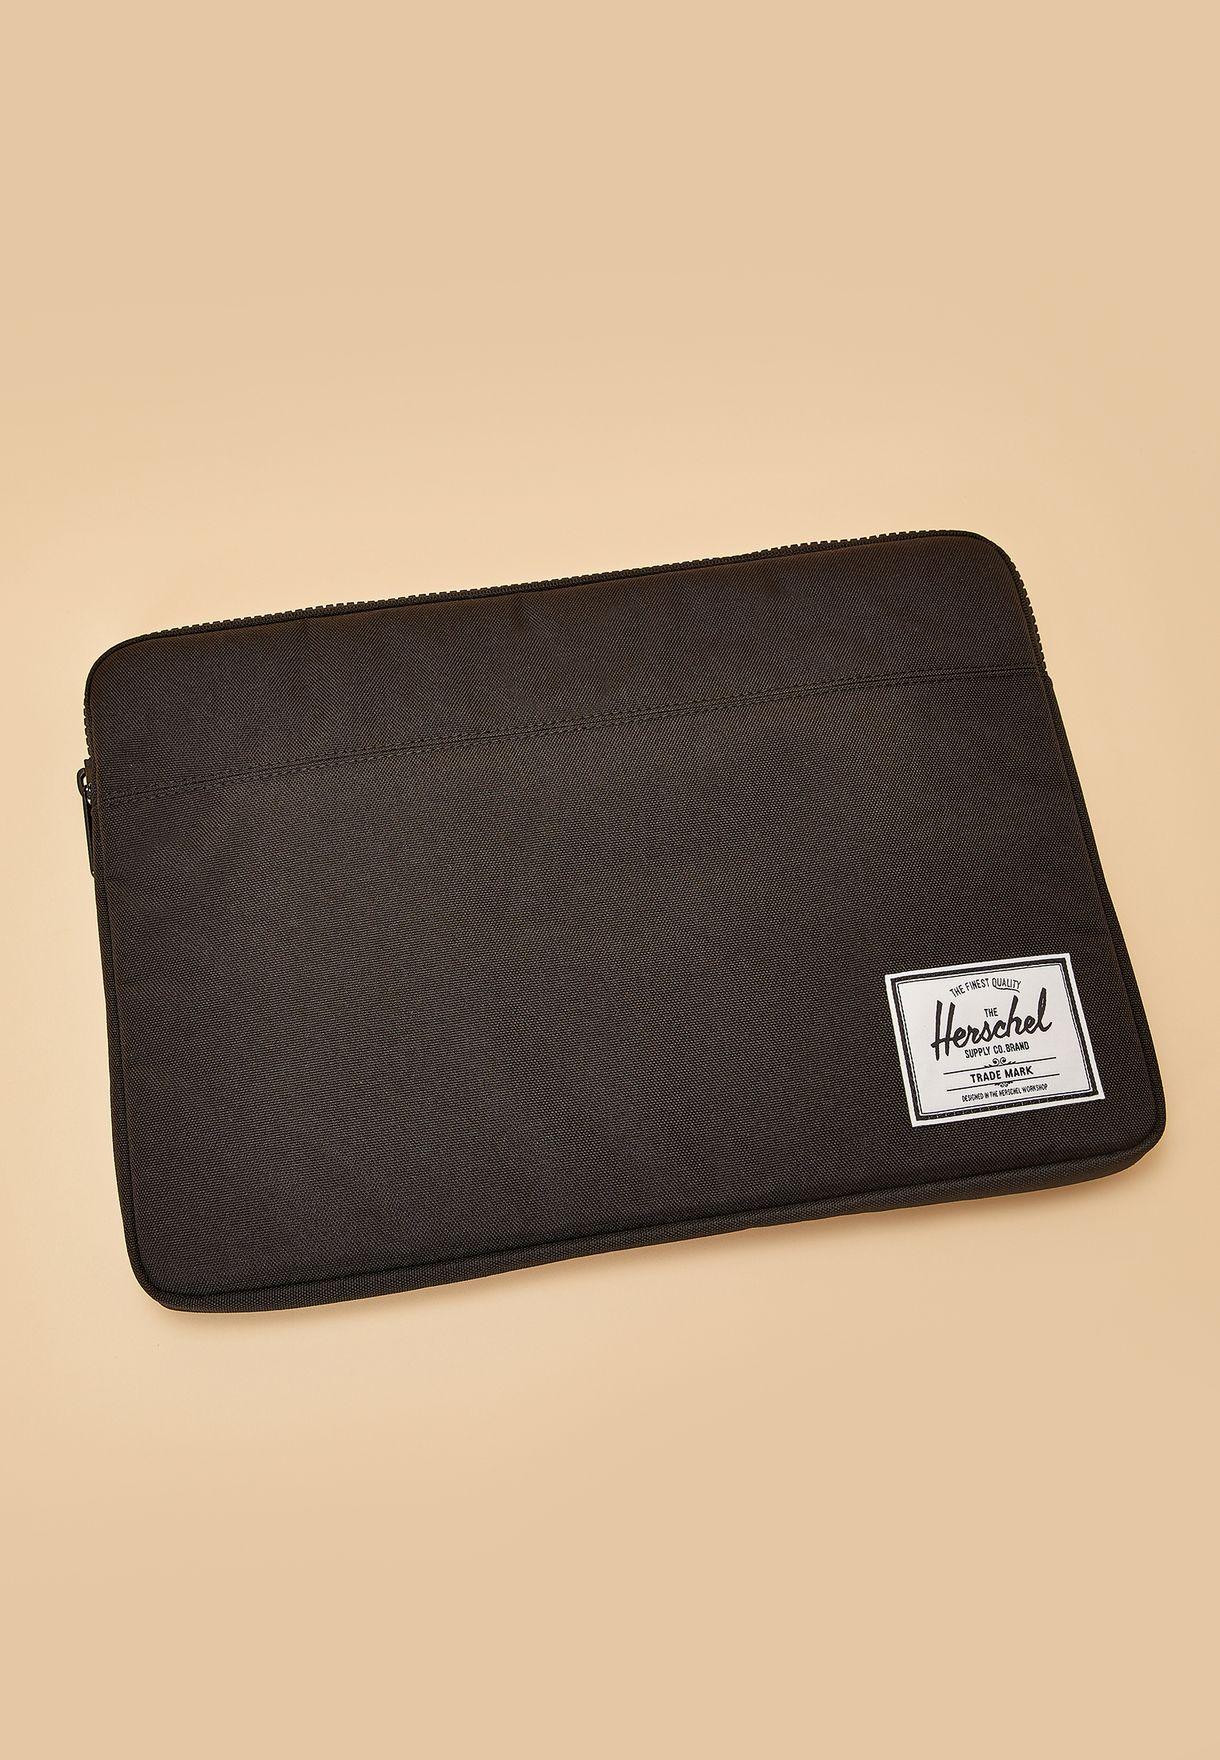 15'' Anchor Macbook Sleeve